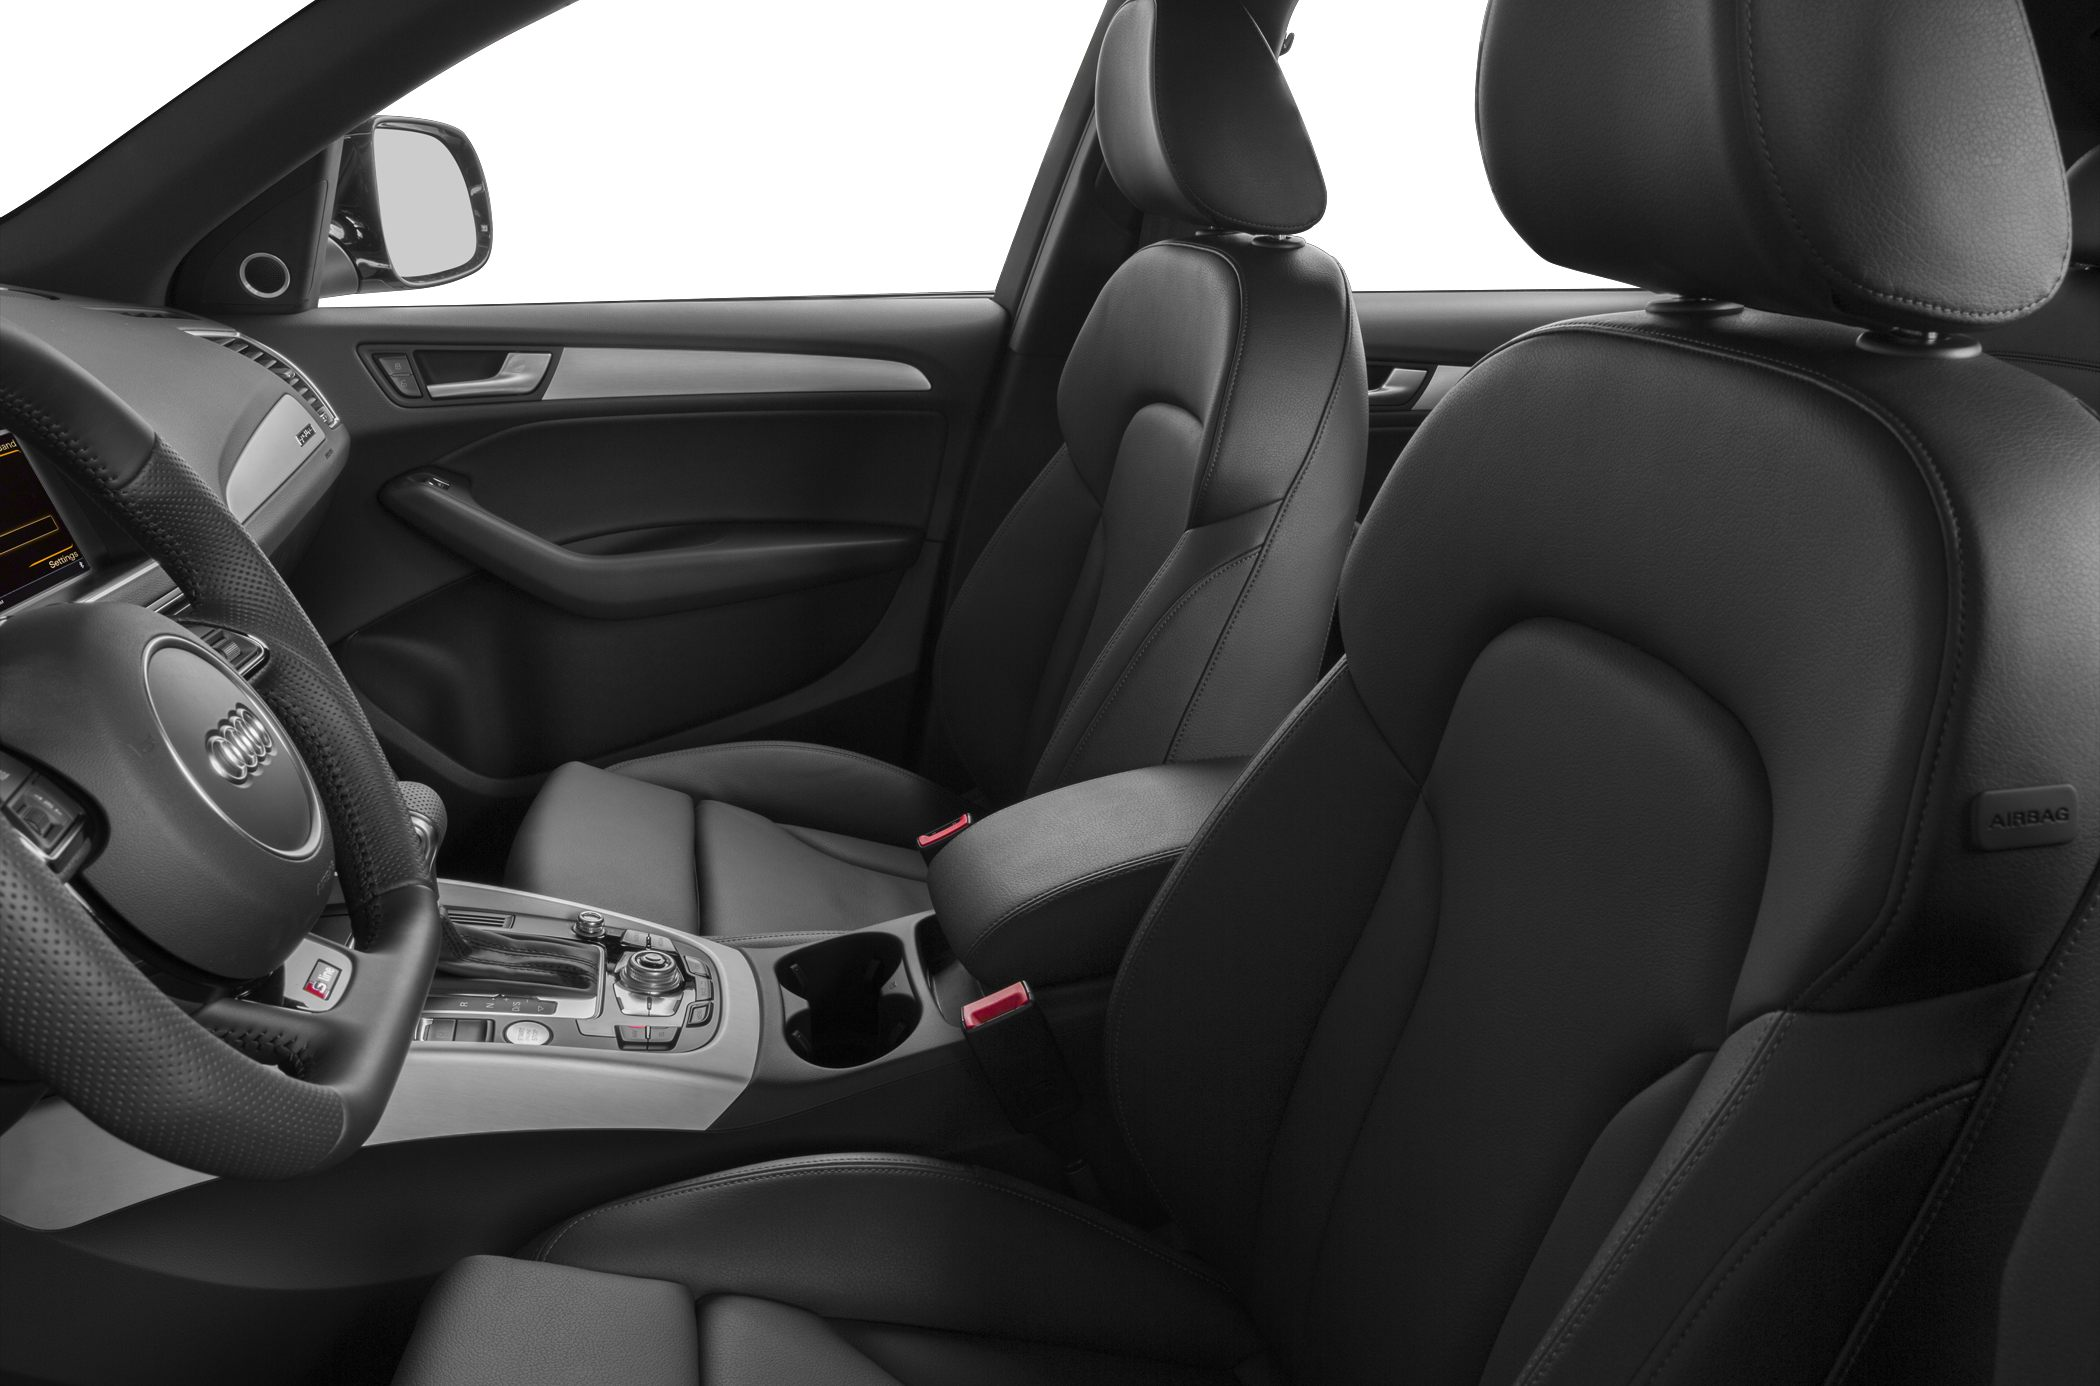 2015 Audi Q5 Hybrid Front